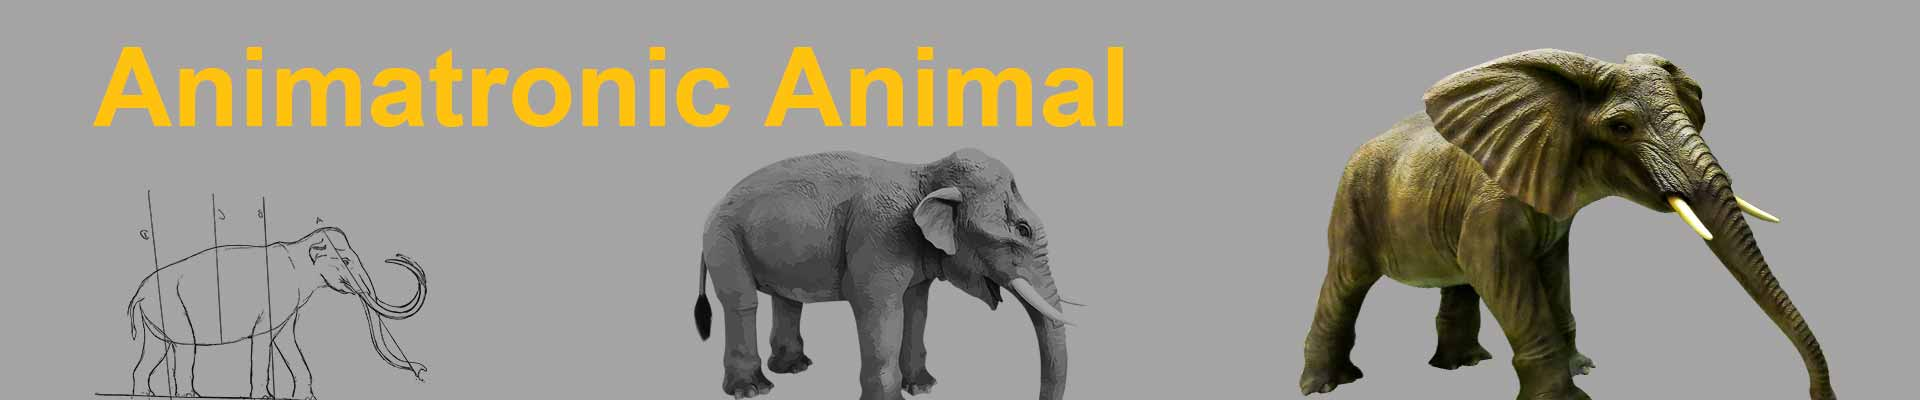 Animatronic Animal